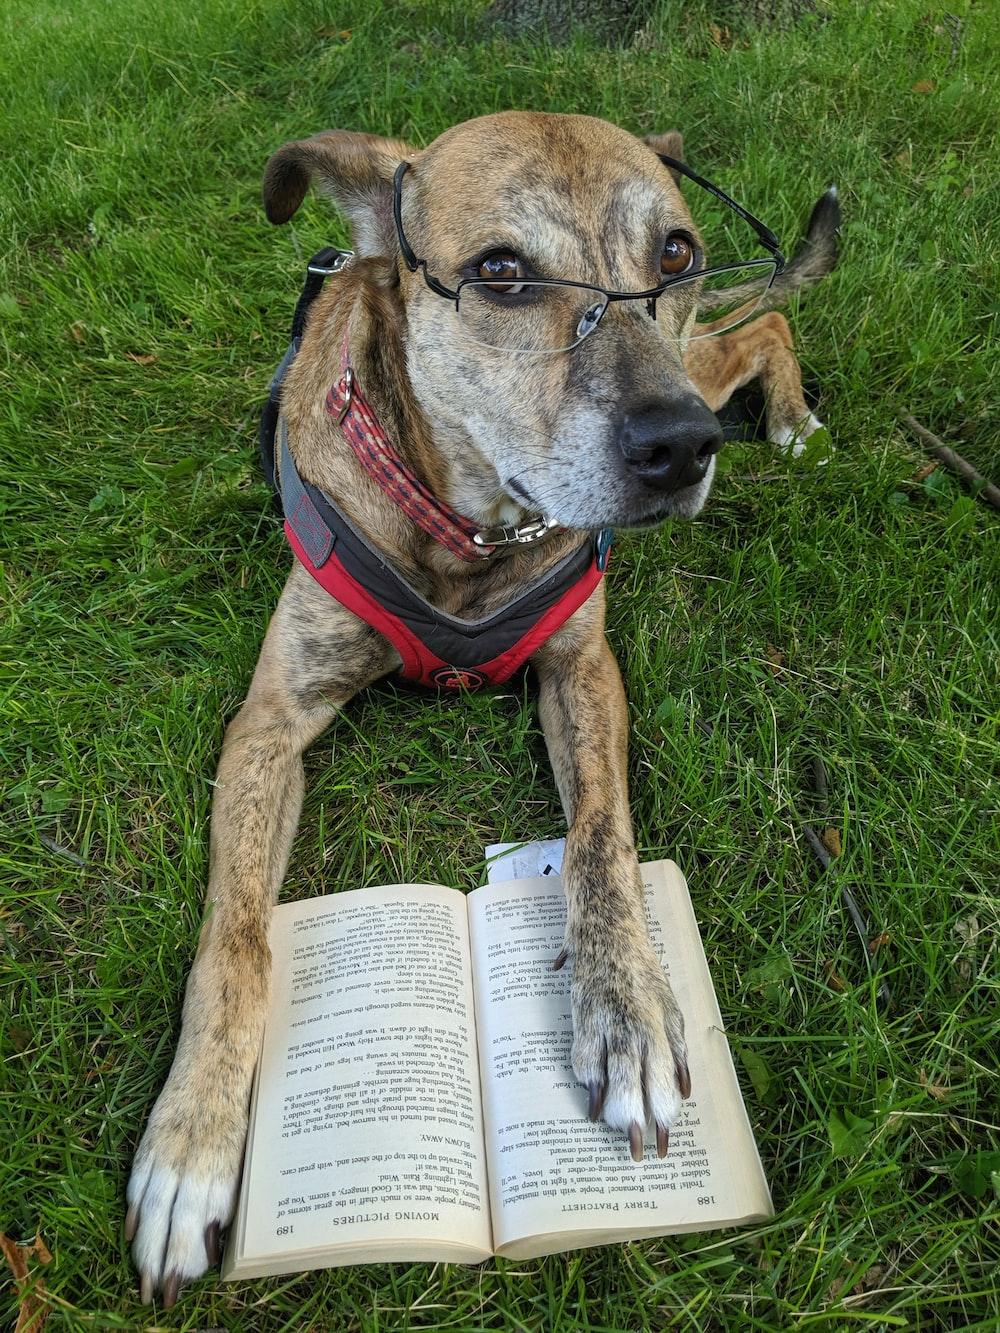 dog wearing eyeglasses sits on grass